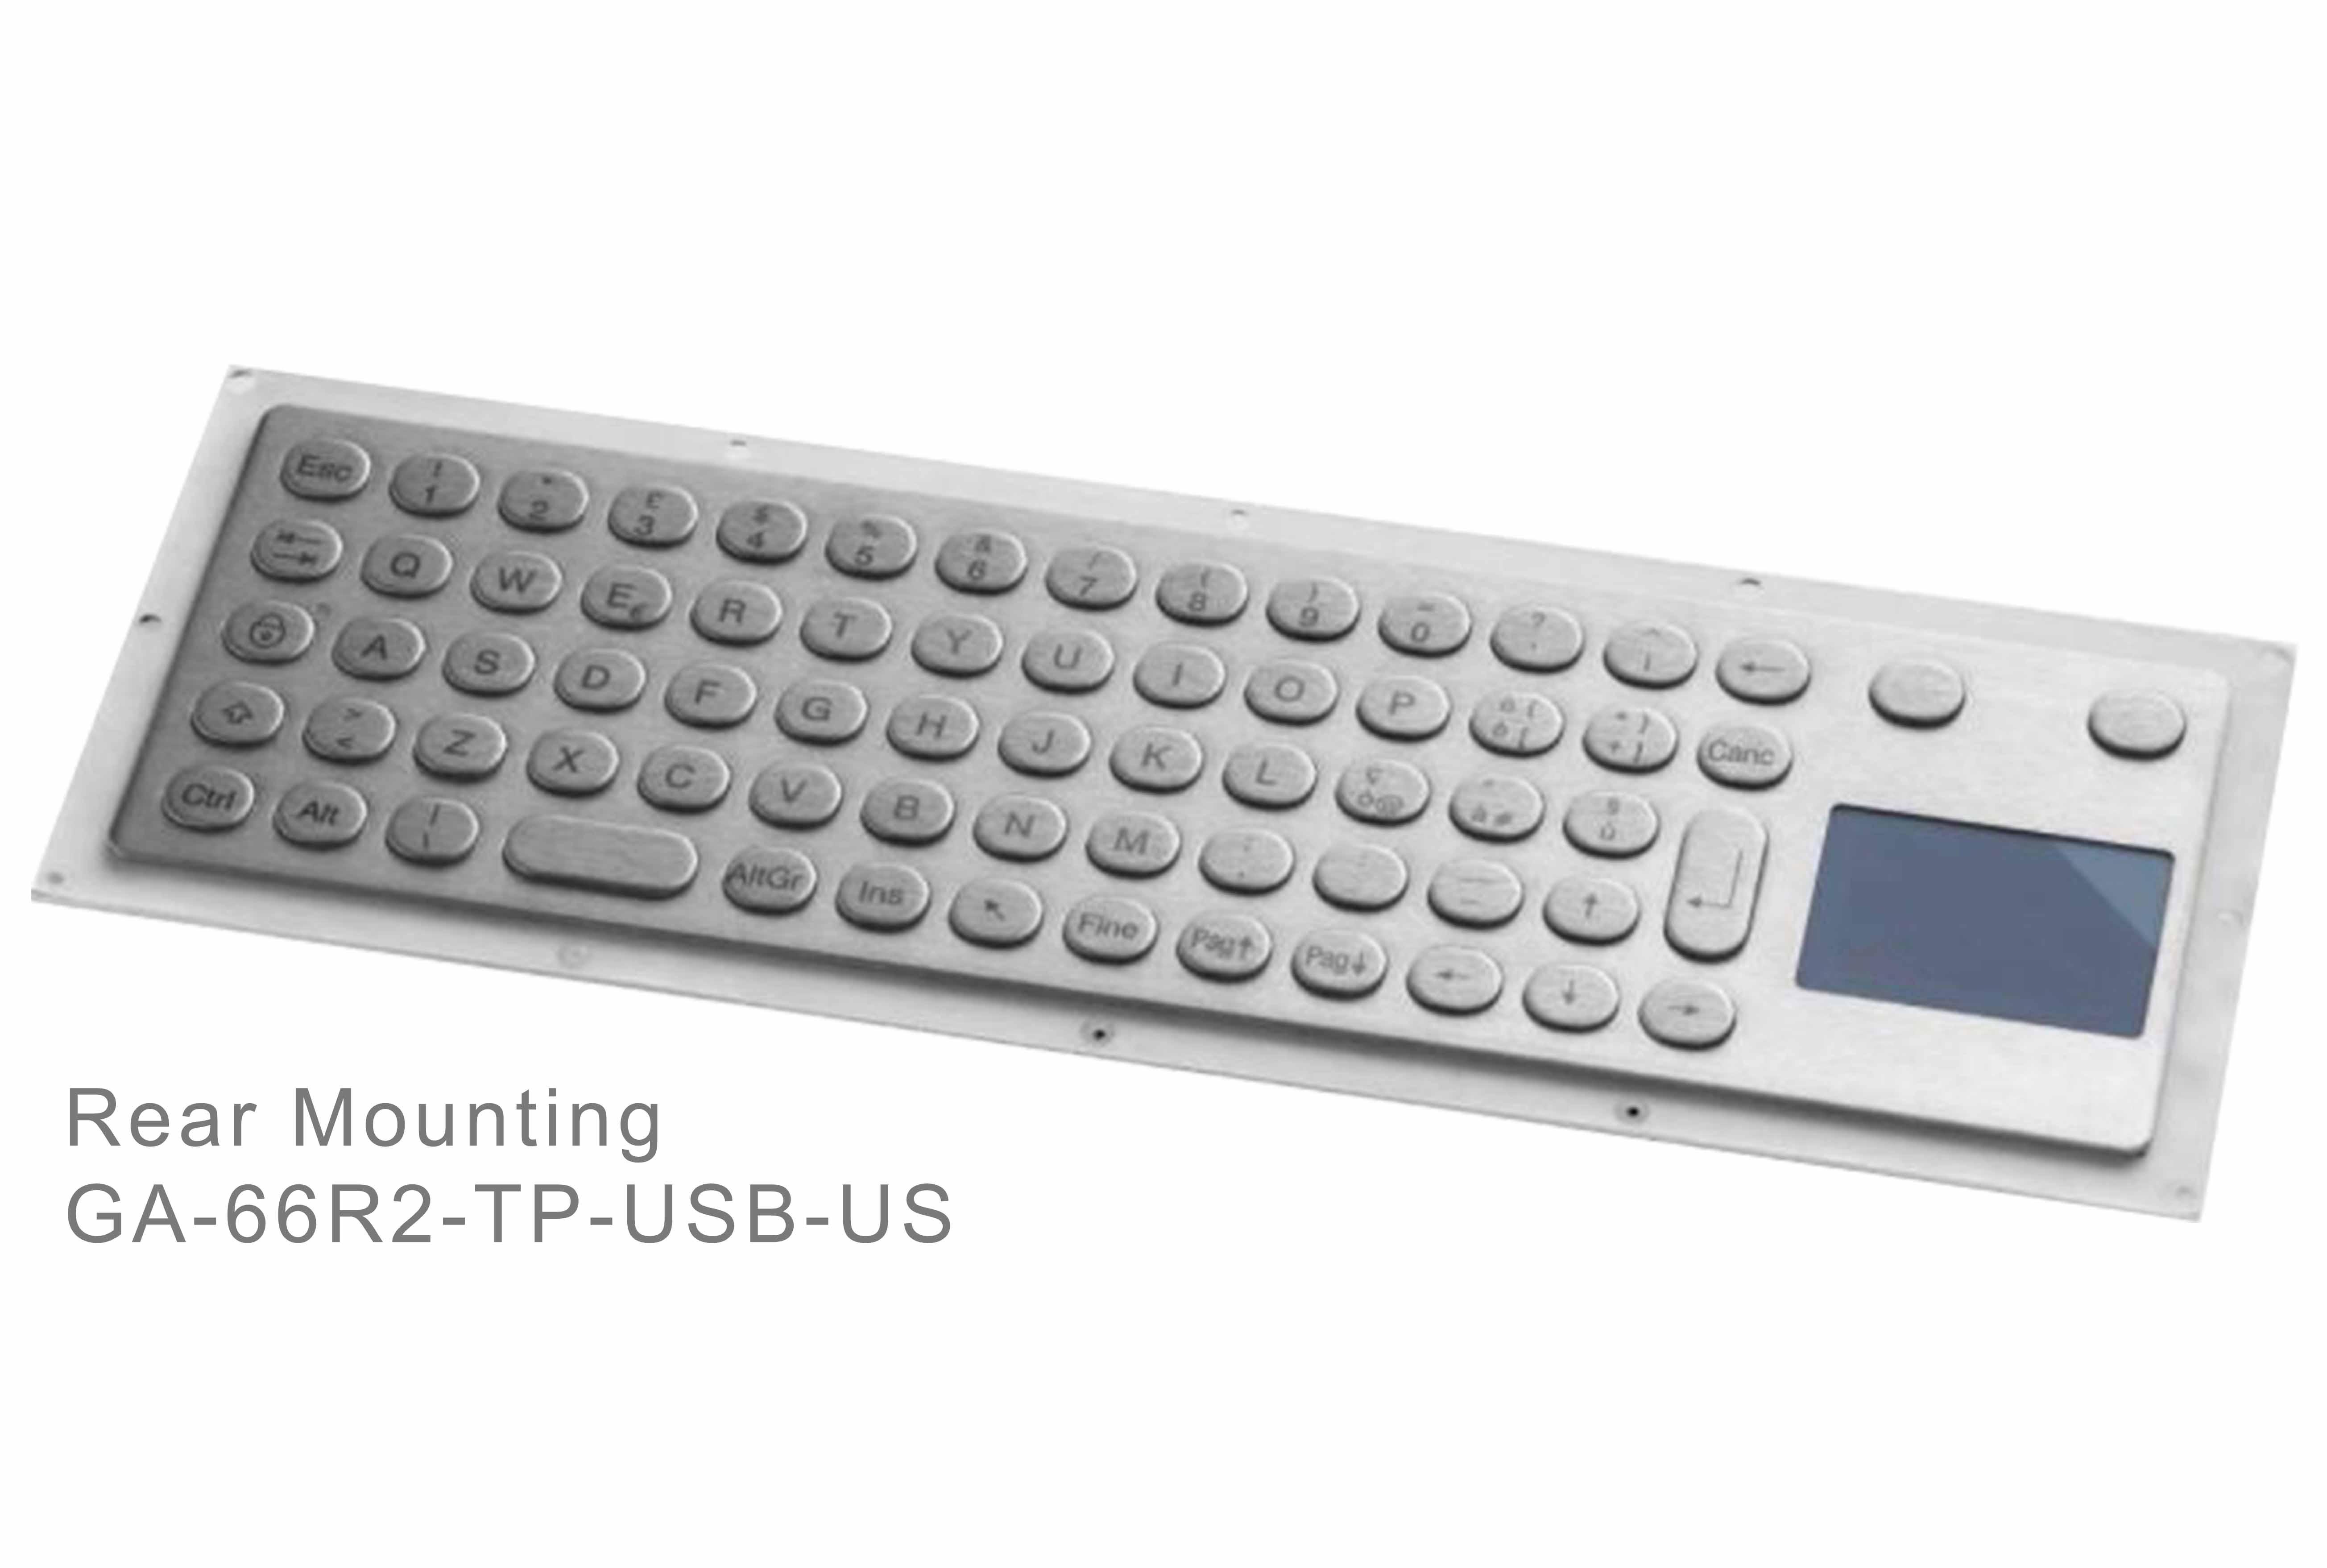 GA-Industrial-Italian Brand-60+Keys Touchpad Rear Mounting-L